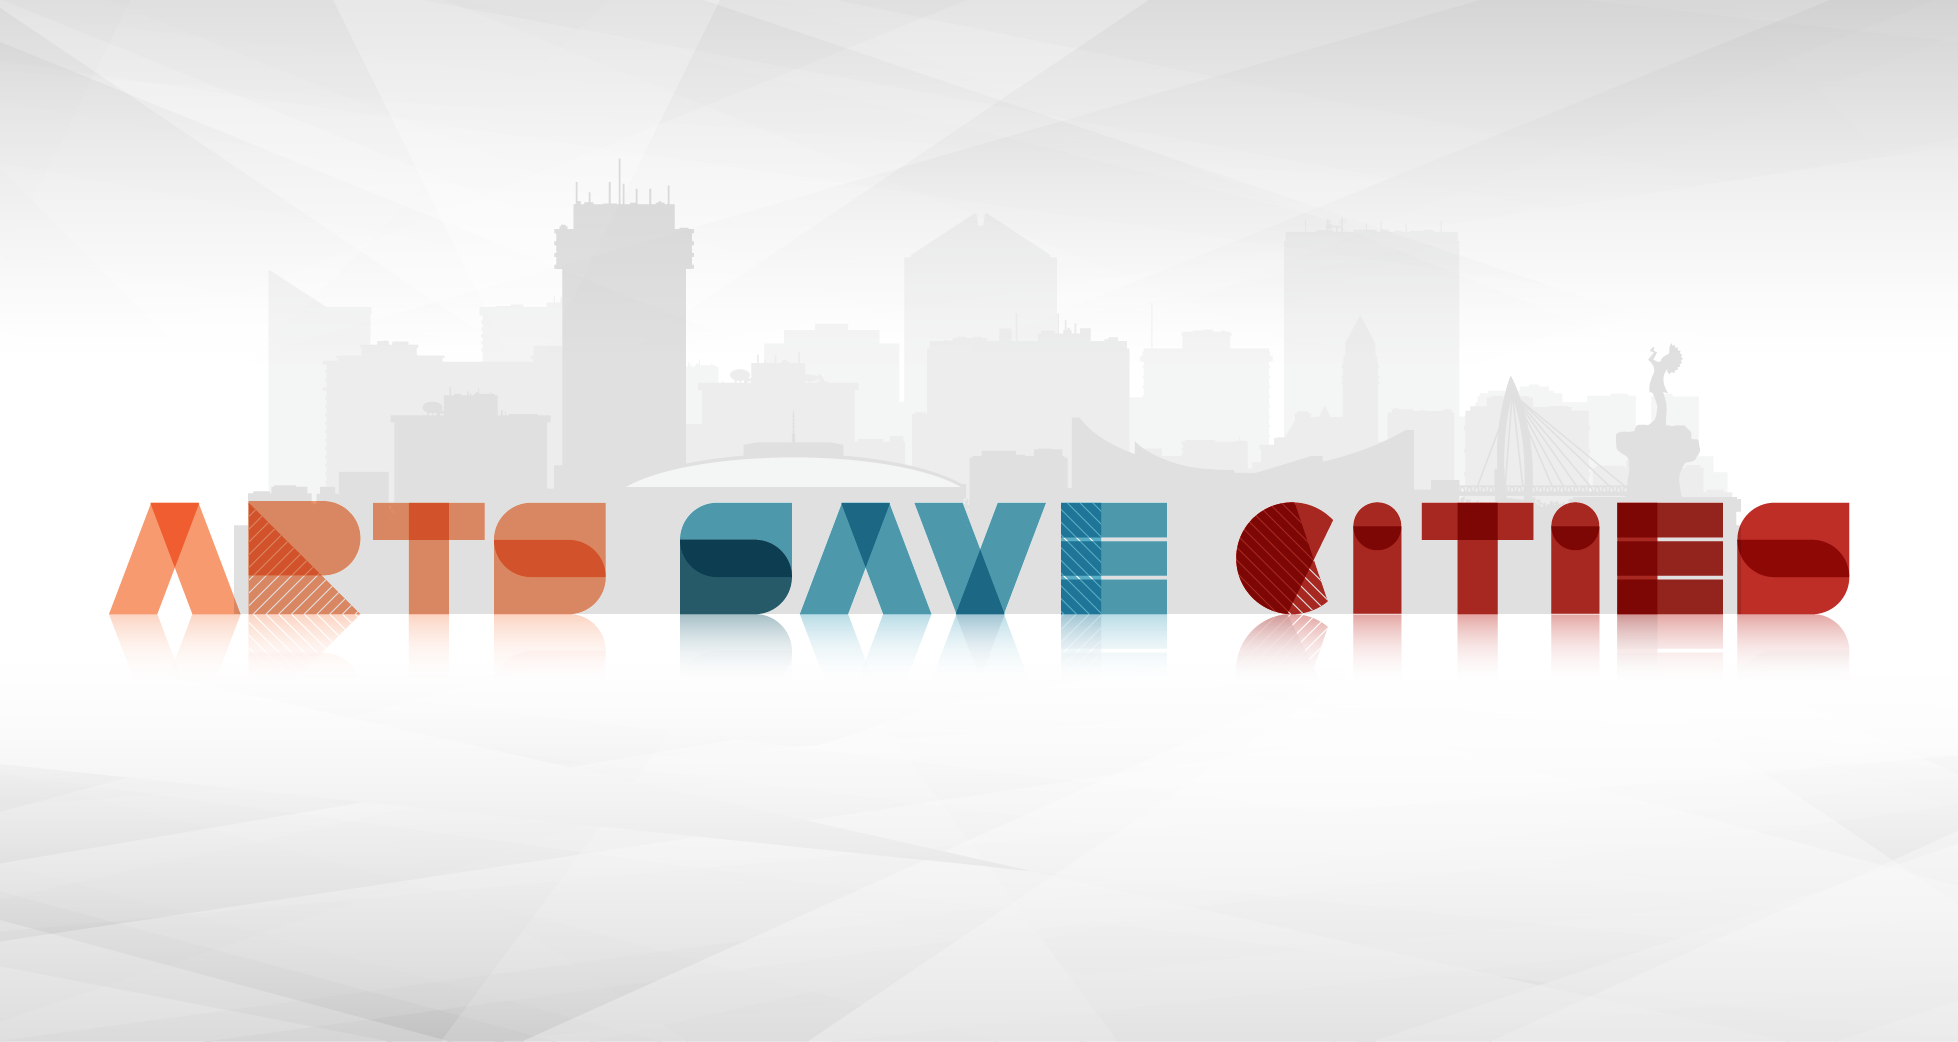 Arts Save Cities